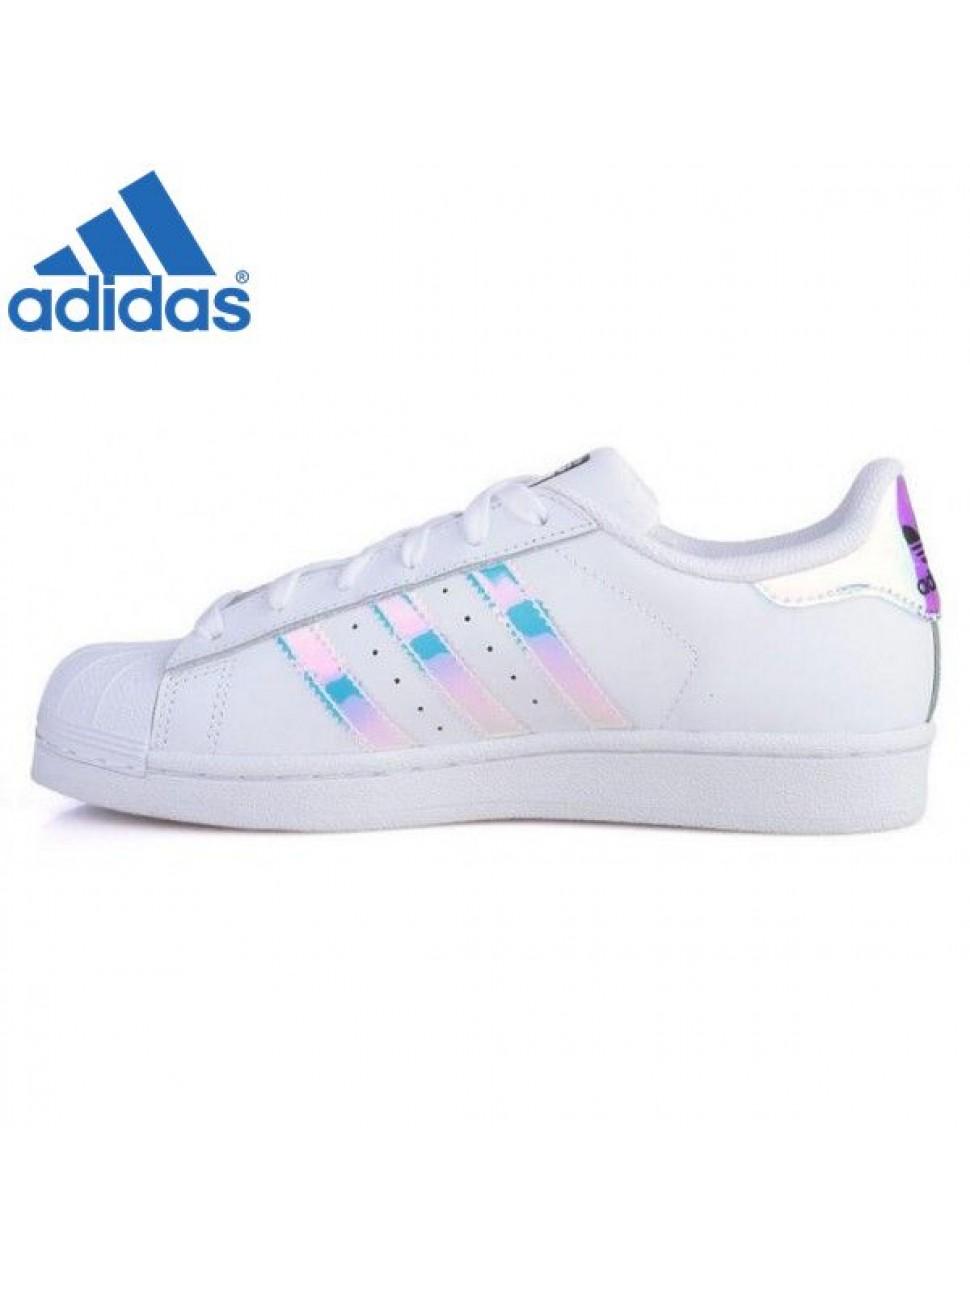 magasin d'usine 2da62 50803 adidas superstar femme junior une vente de liquidation de ...